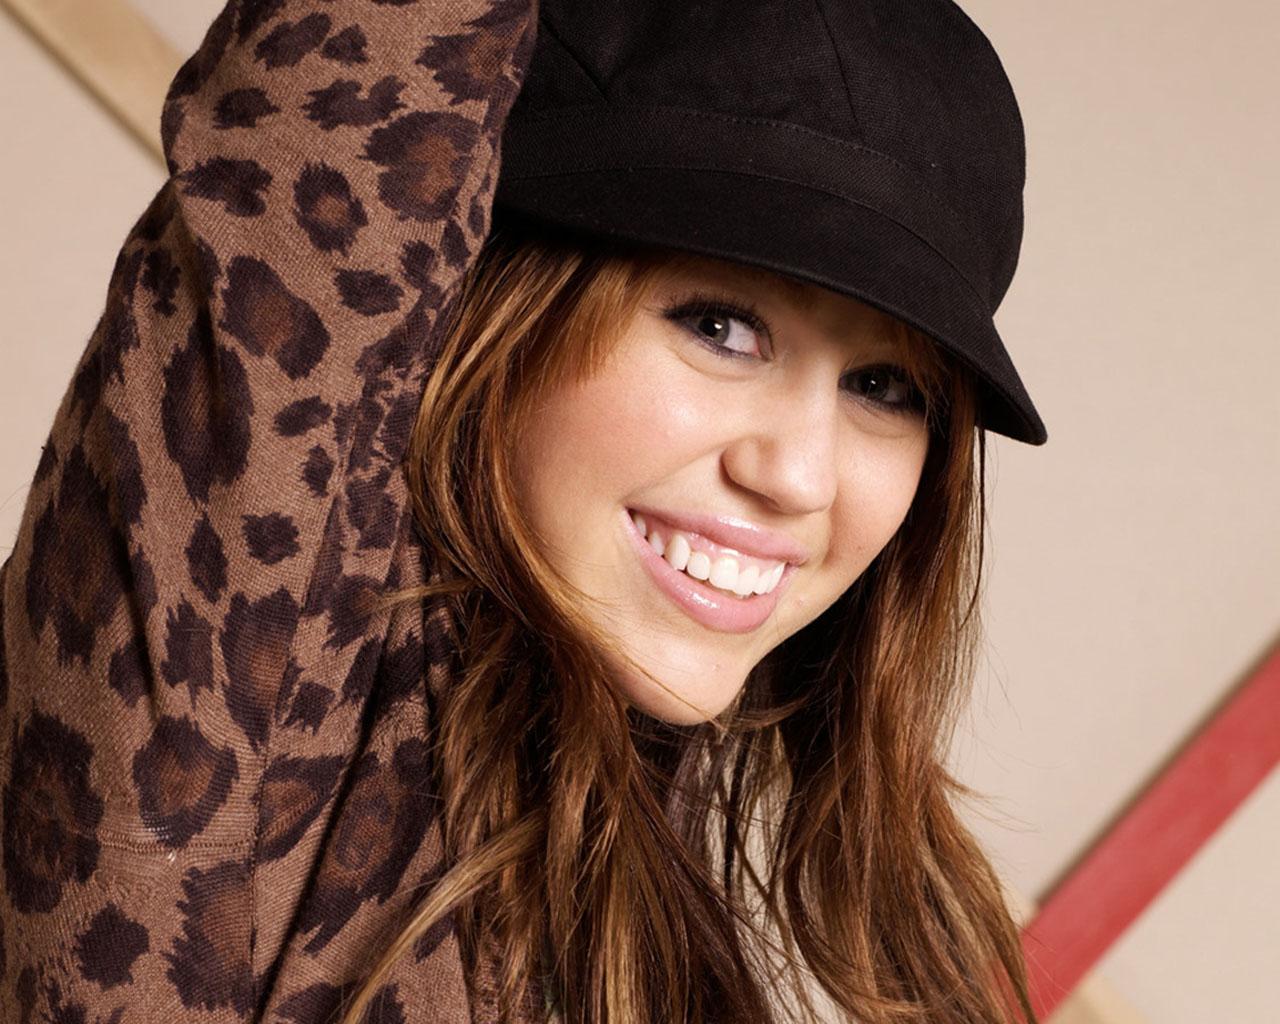 Best Miley Cyrus